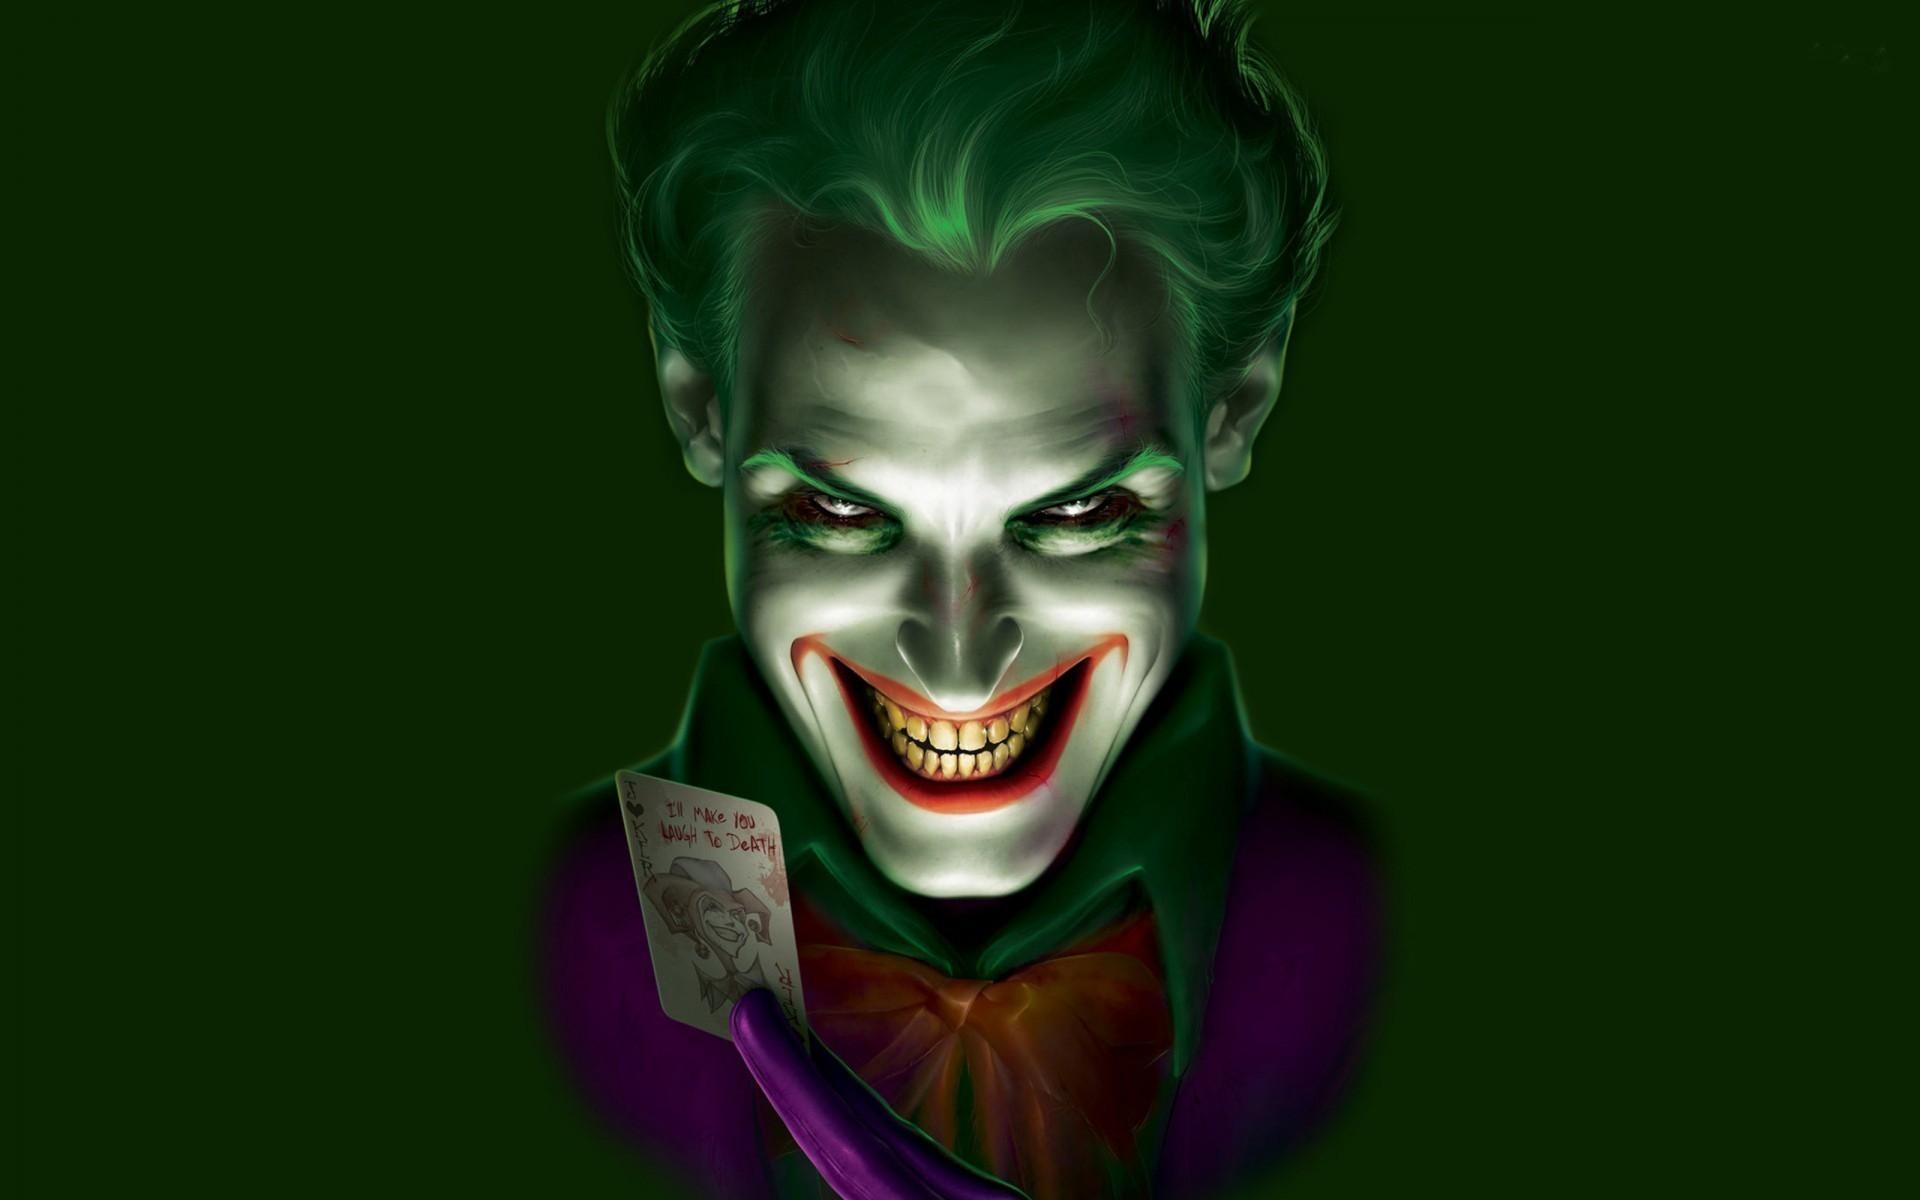 HD IPhone Joker Wallpaper (75+ Images